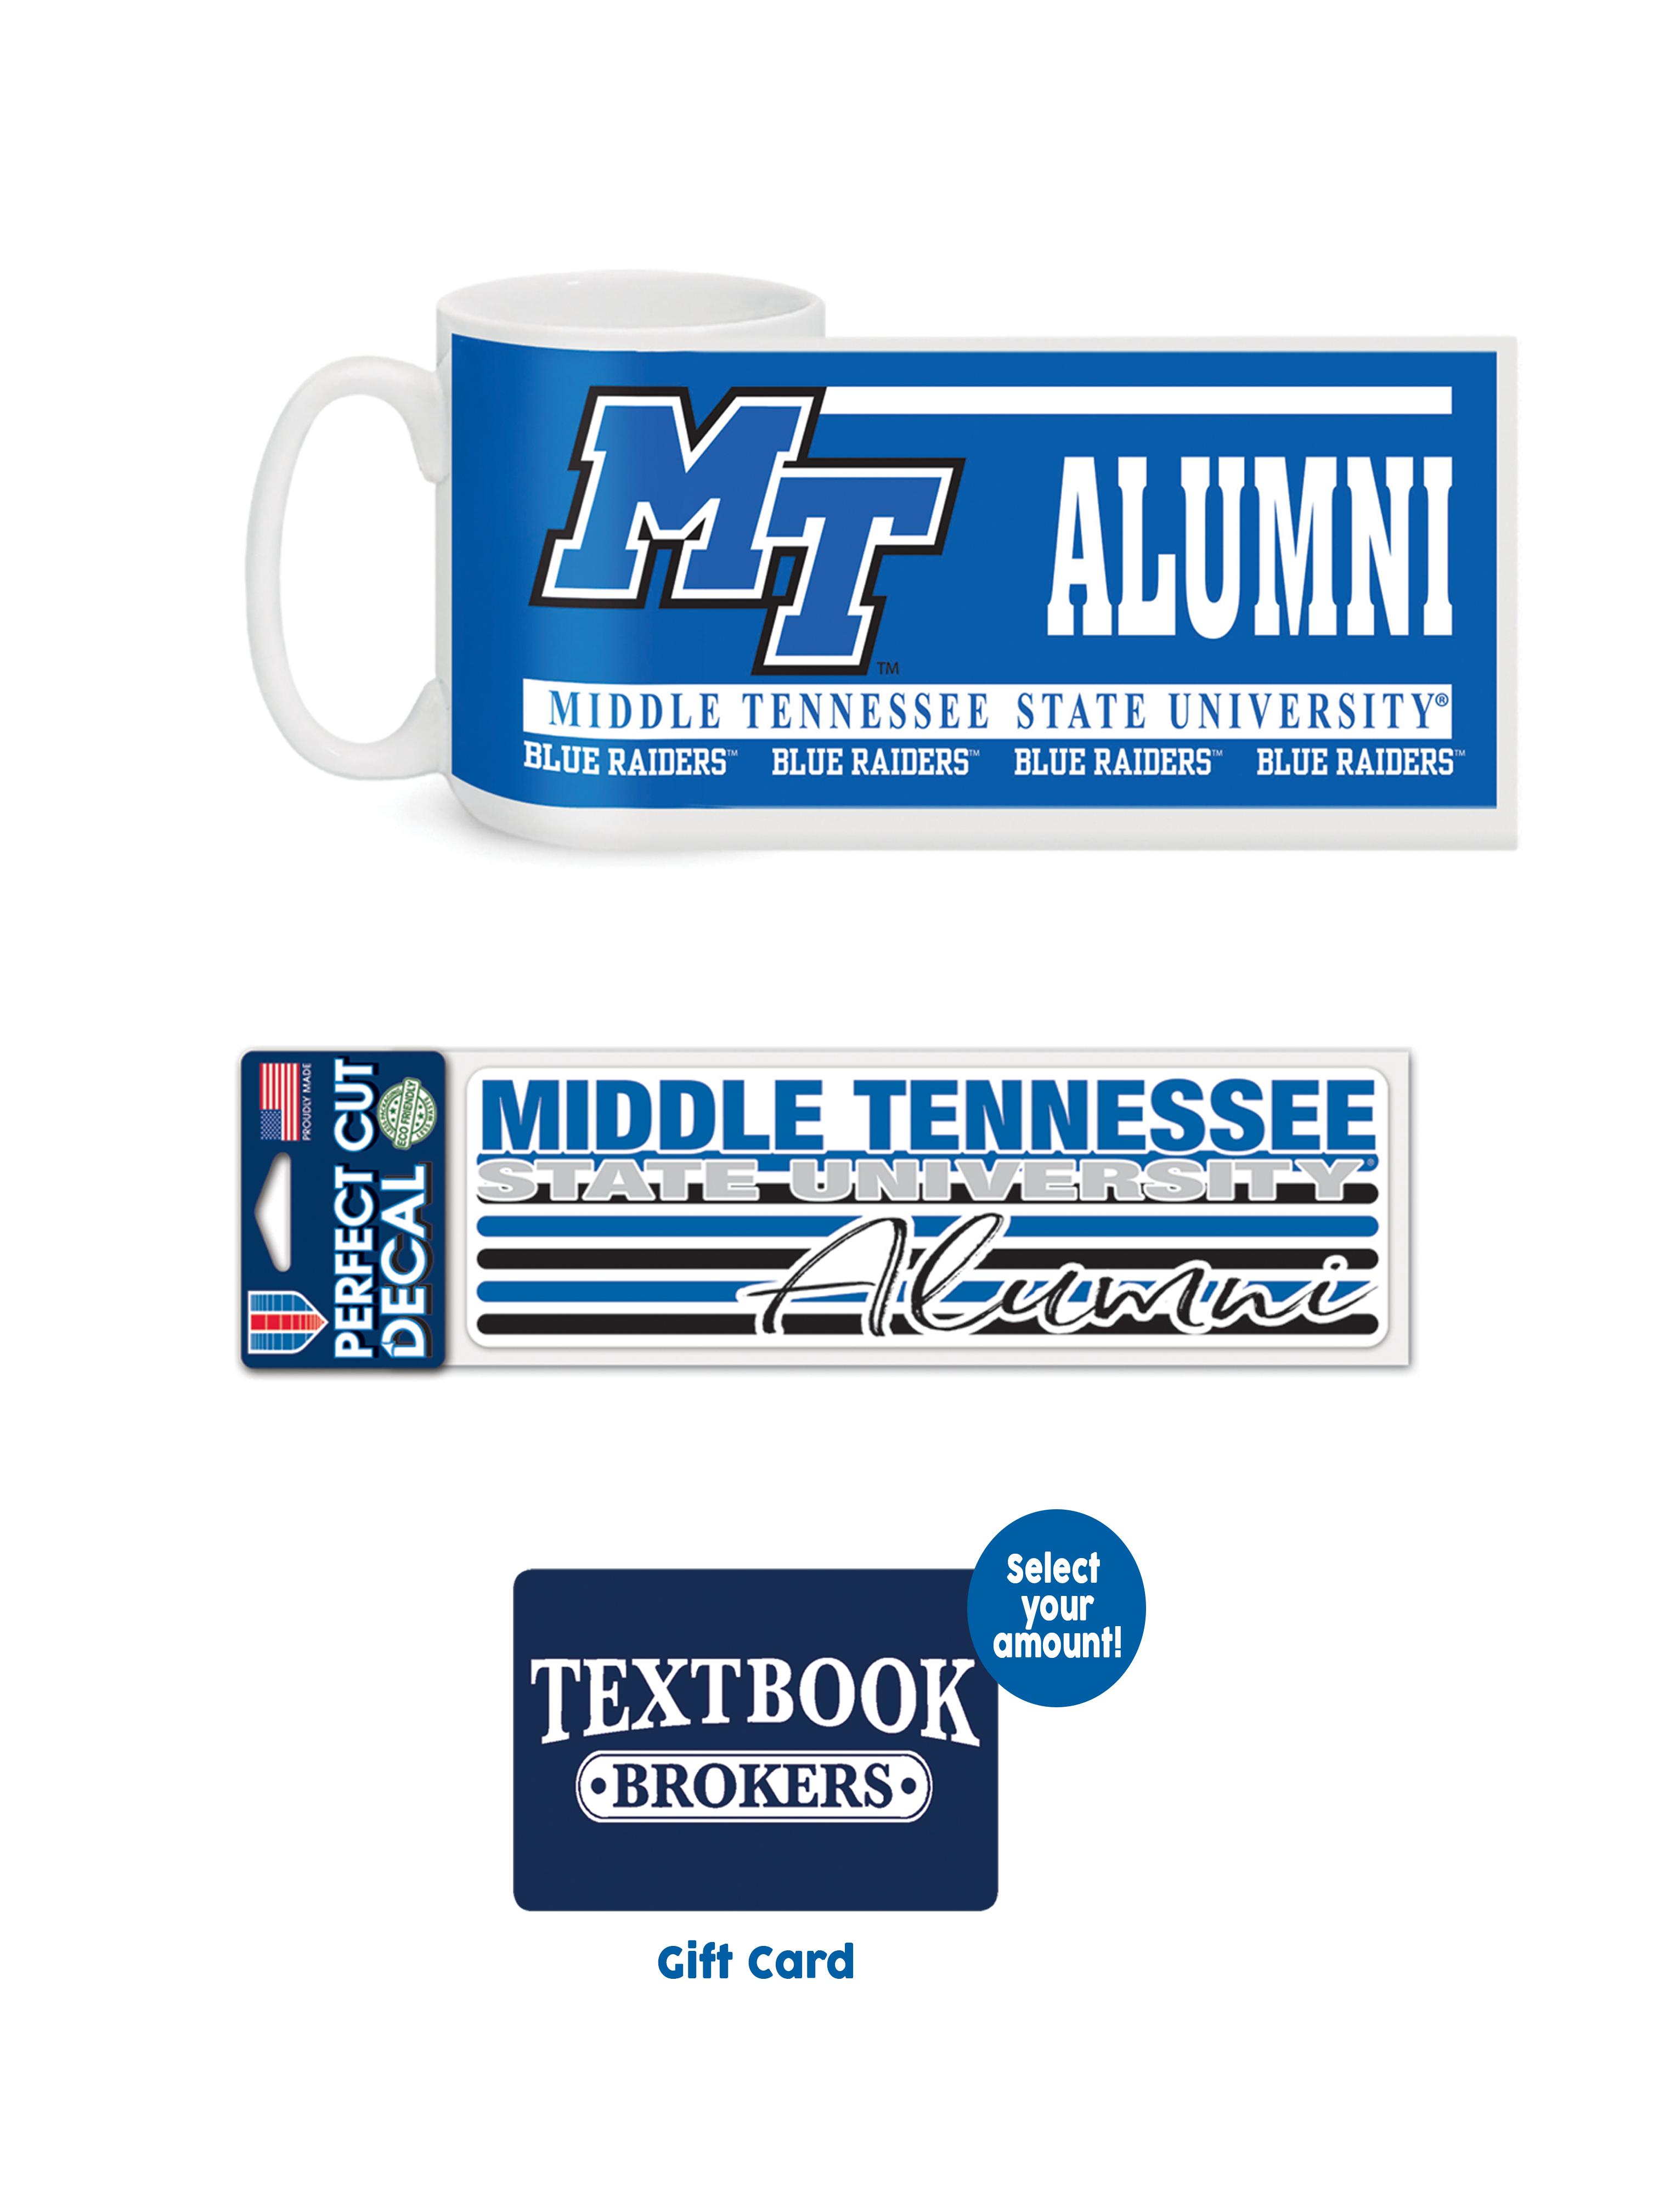 Alumni Gift Pack #1